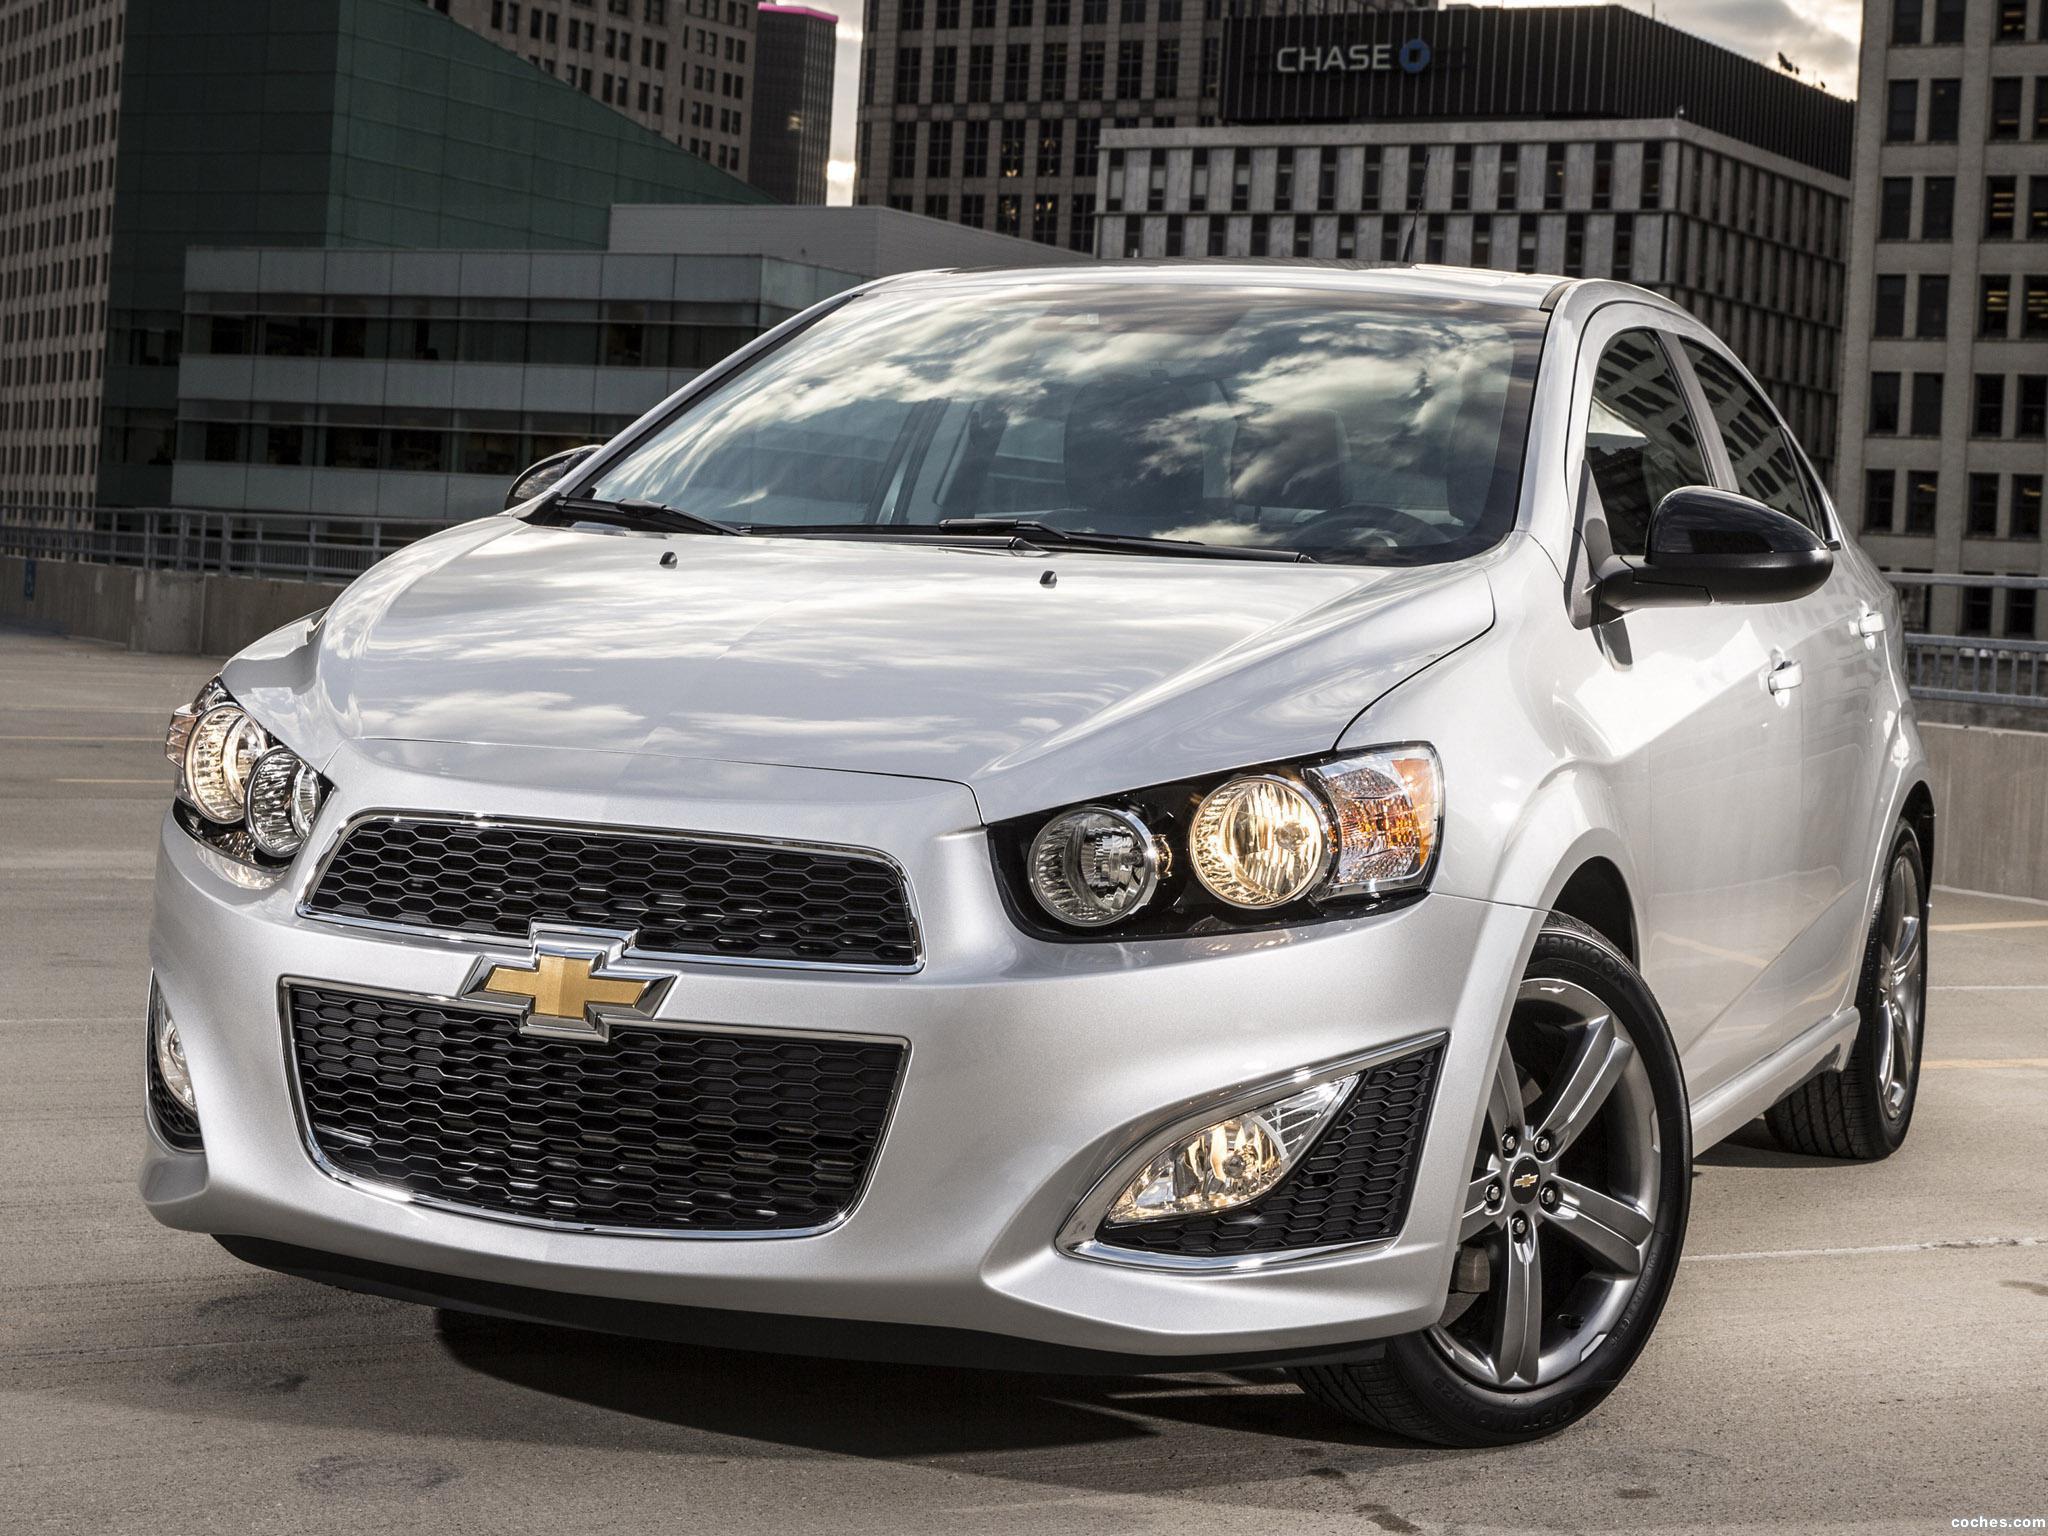 Fotos de Chevrolet Sonic RS Sedan 2014